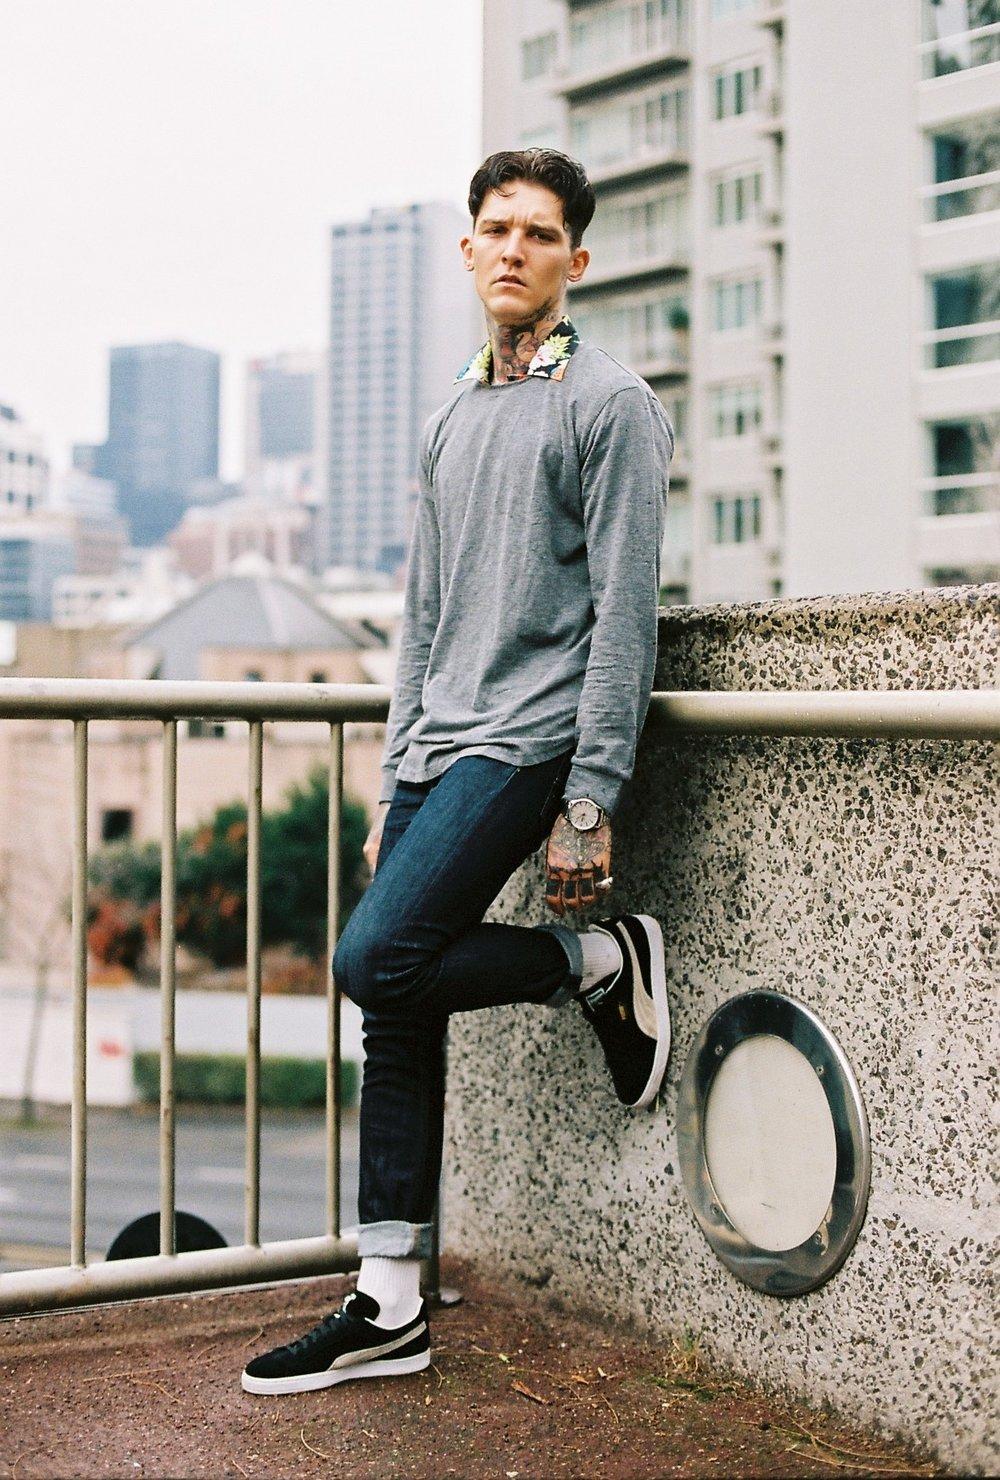 Long sleeve shirt: @inflation Jeans: @levis Shoes @puma Button up shirt: @jacklondon